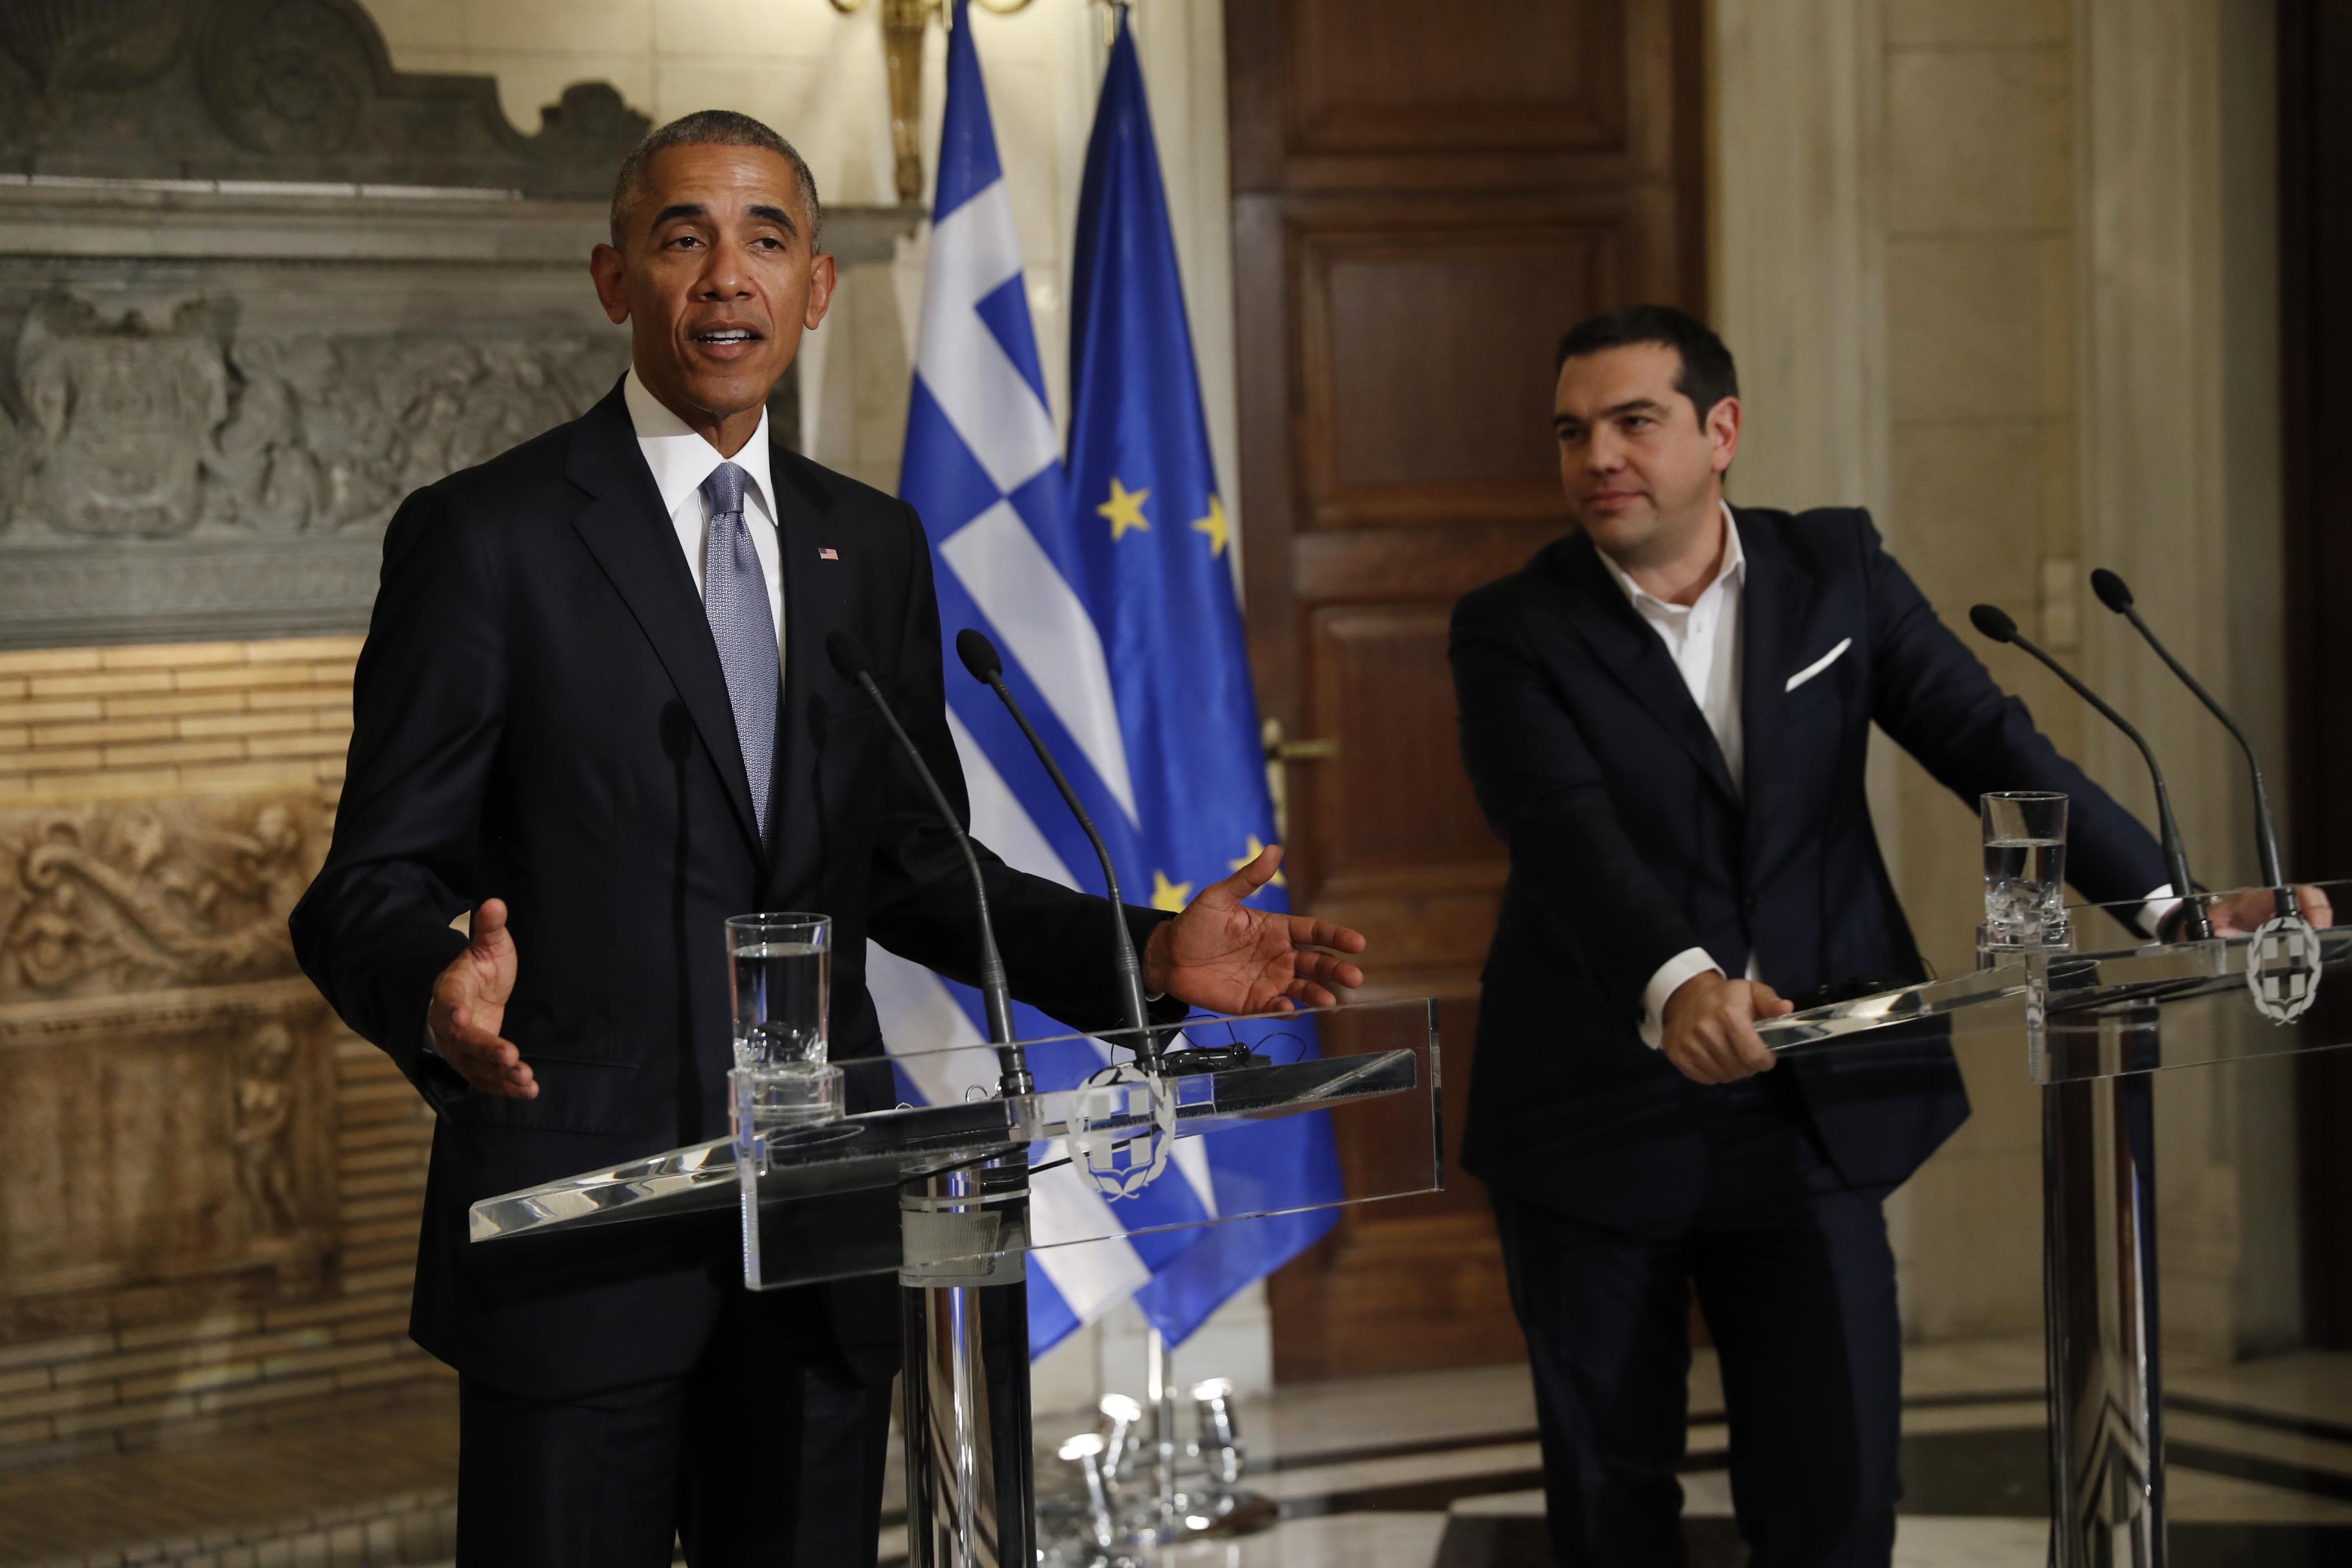 President Obama Warns Against 'Crude Nationalism'